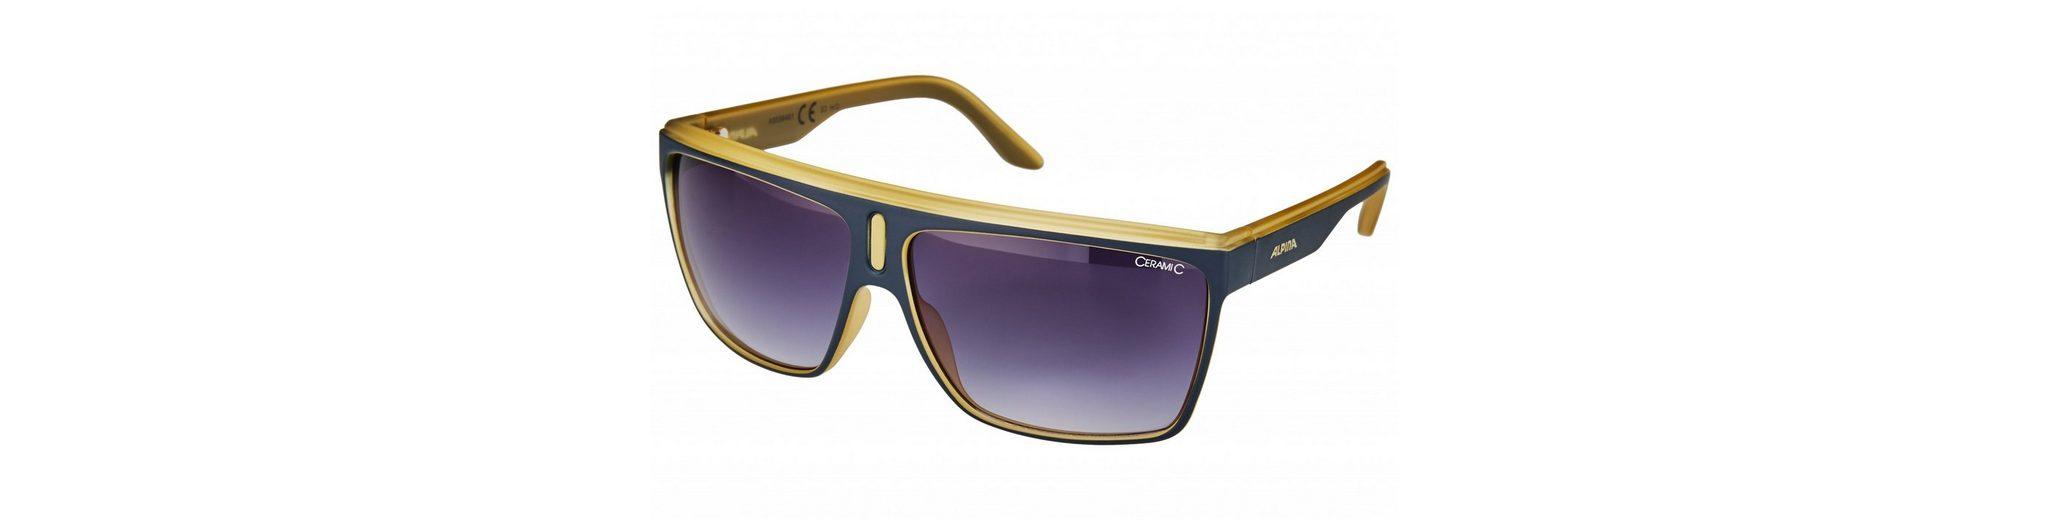 Alpina Radsportbrille »Baranya Brille«